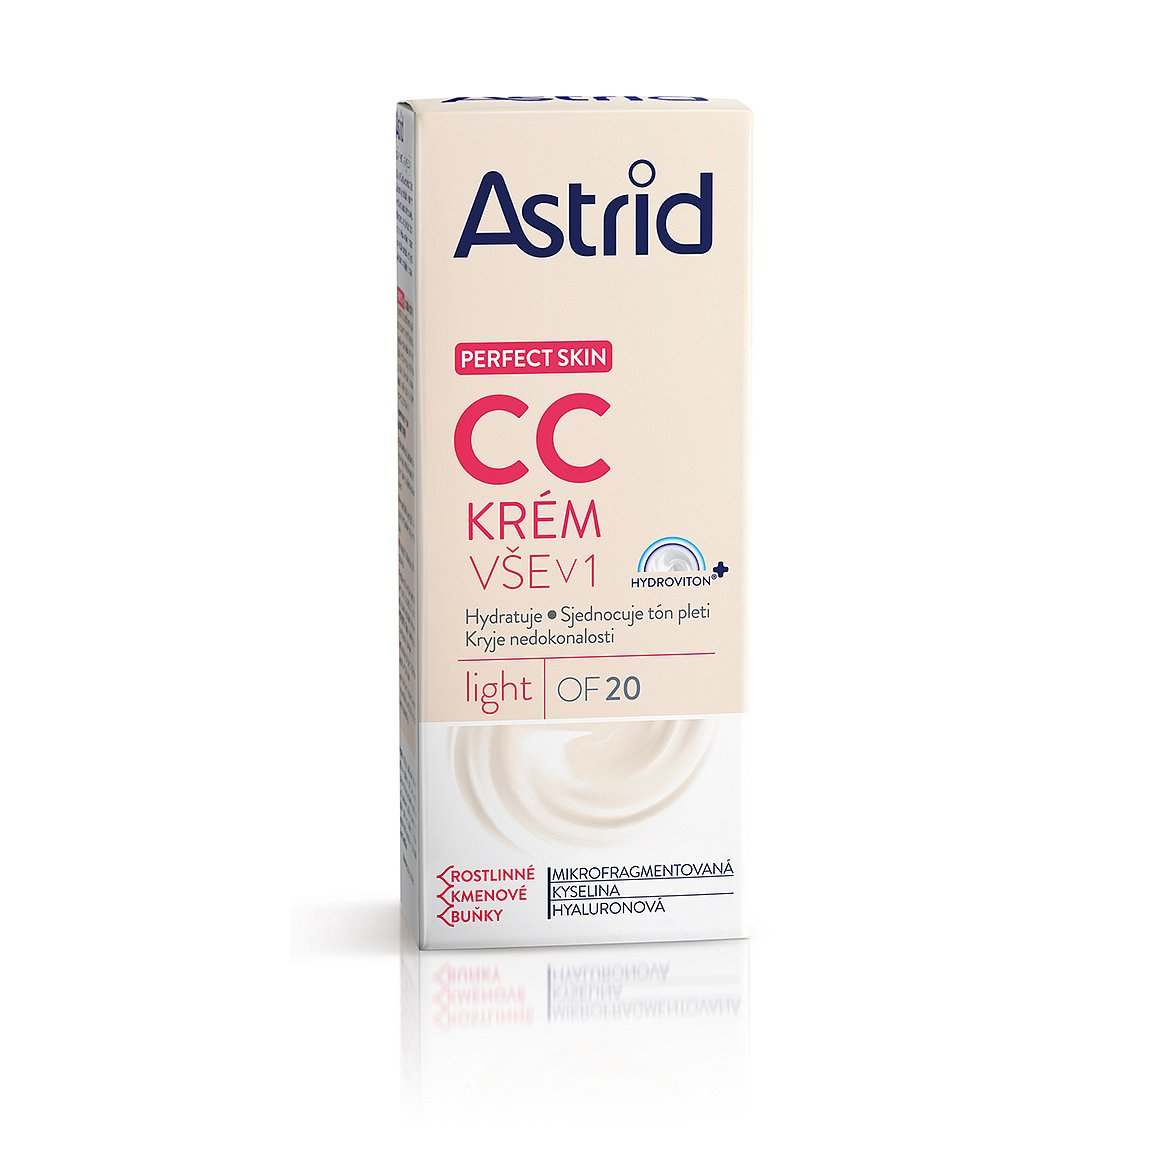 Astrid Perfect Skin CC krém vše v 1 OF 20 light, 40 ml